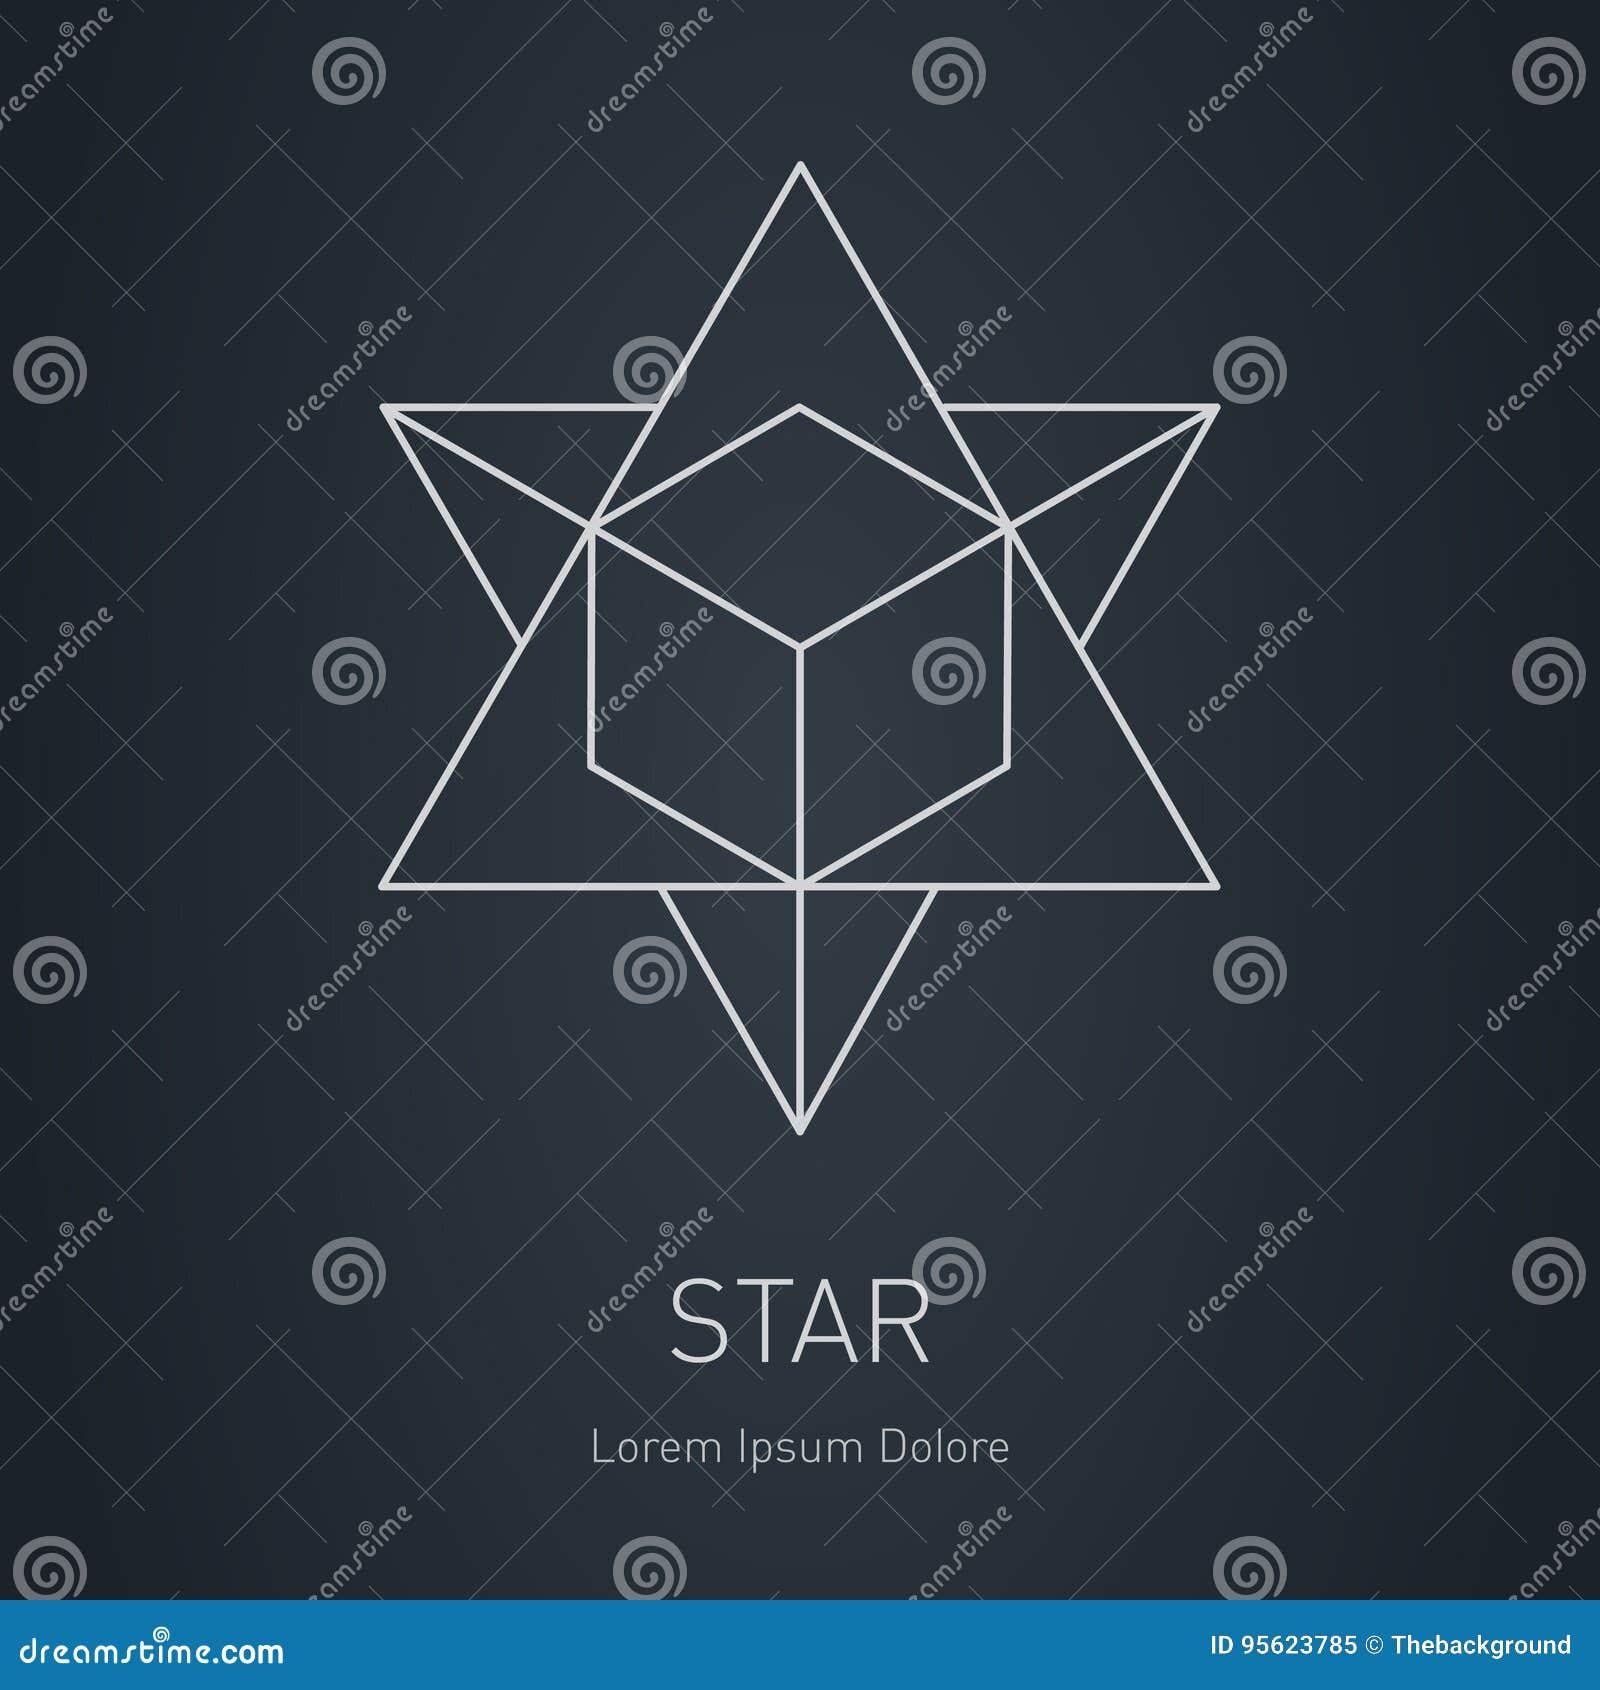 Veelhoekige Ster met binnen kubus, Modern modieus embleem Ontwerp ele